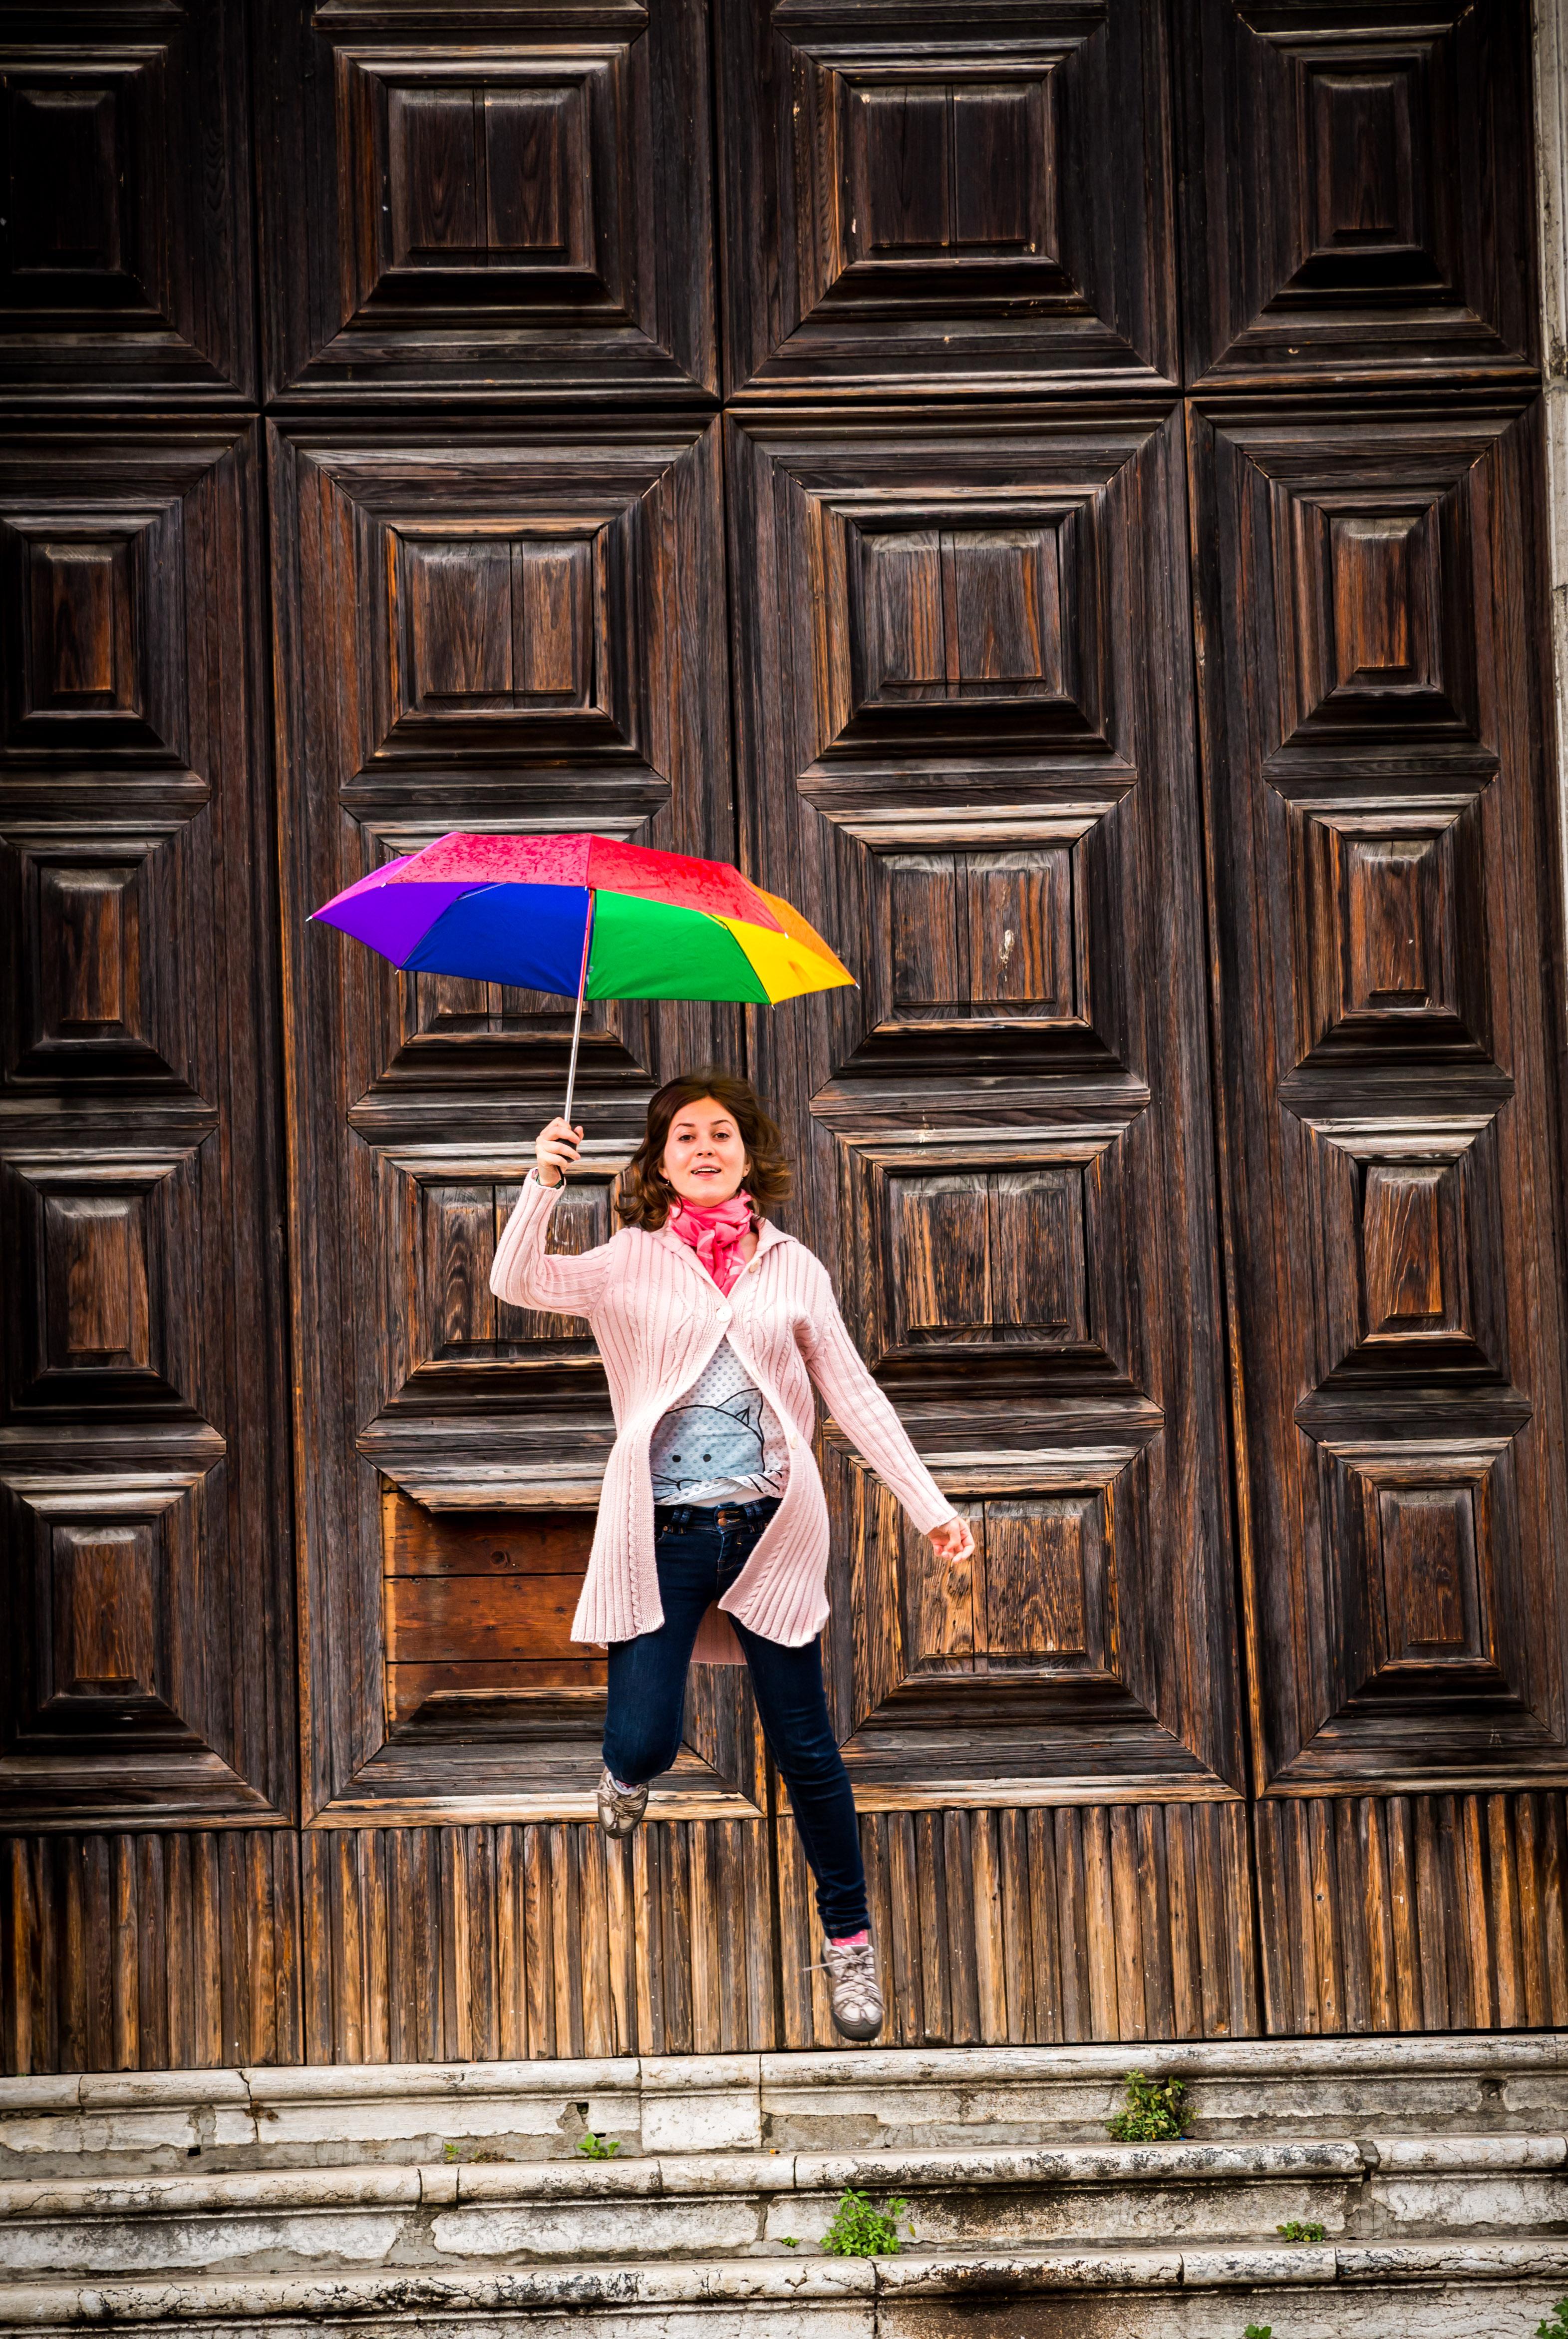 Foap-Umbrella_Fun_in_Venice